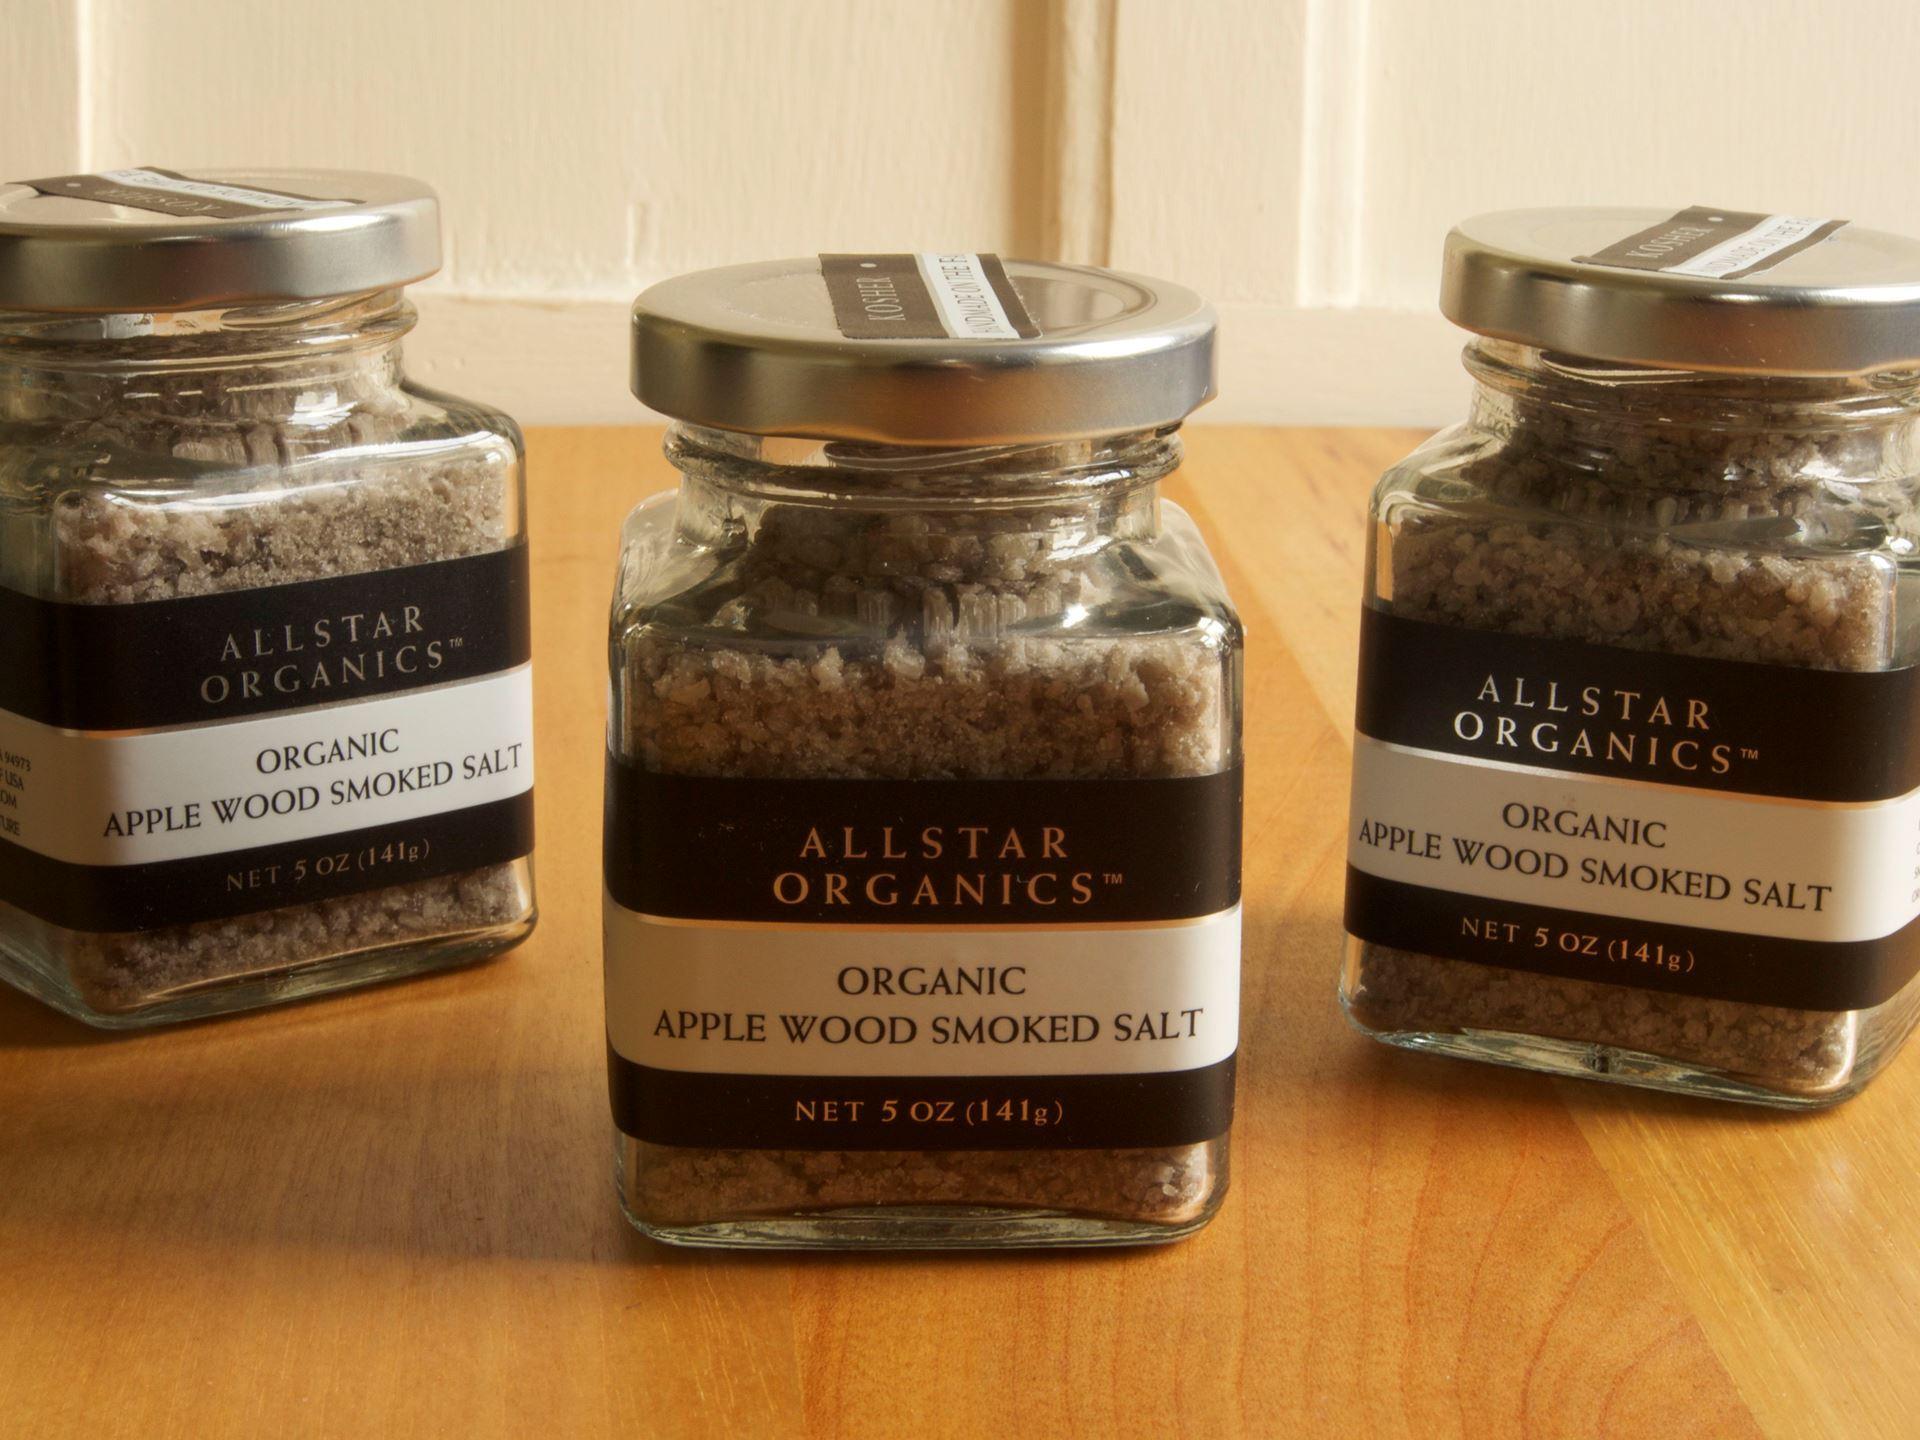 Picture of Allstar Organics Applewood Smoked Salt